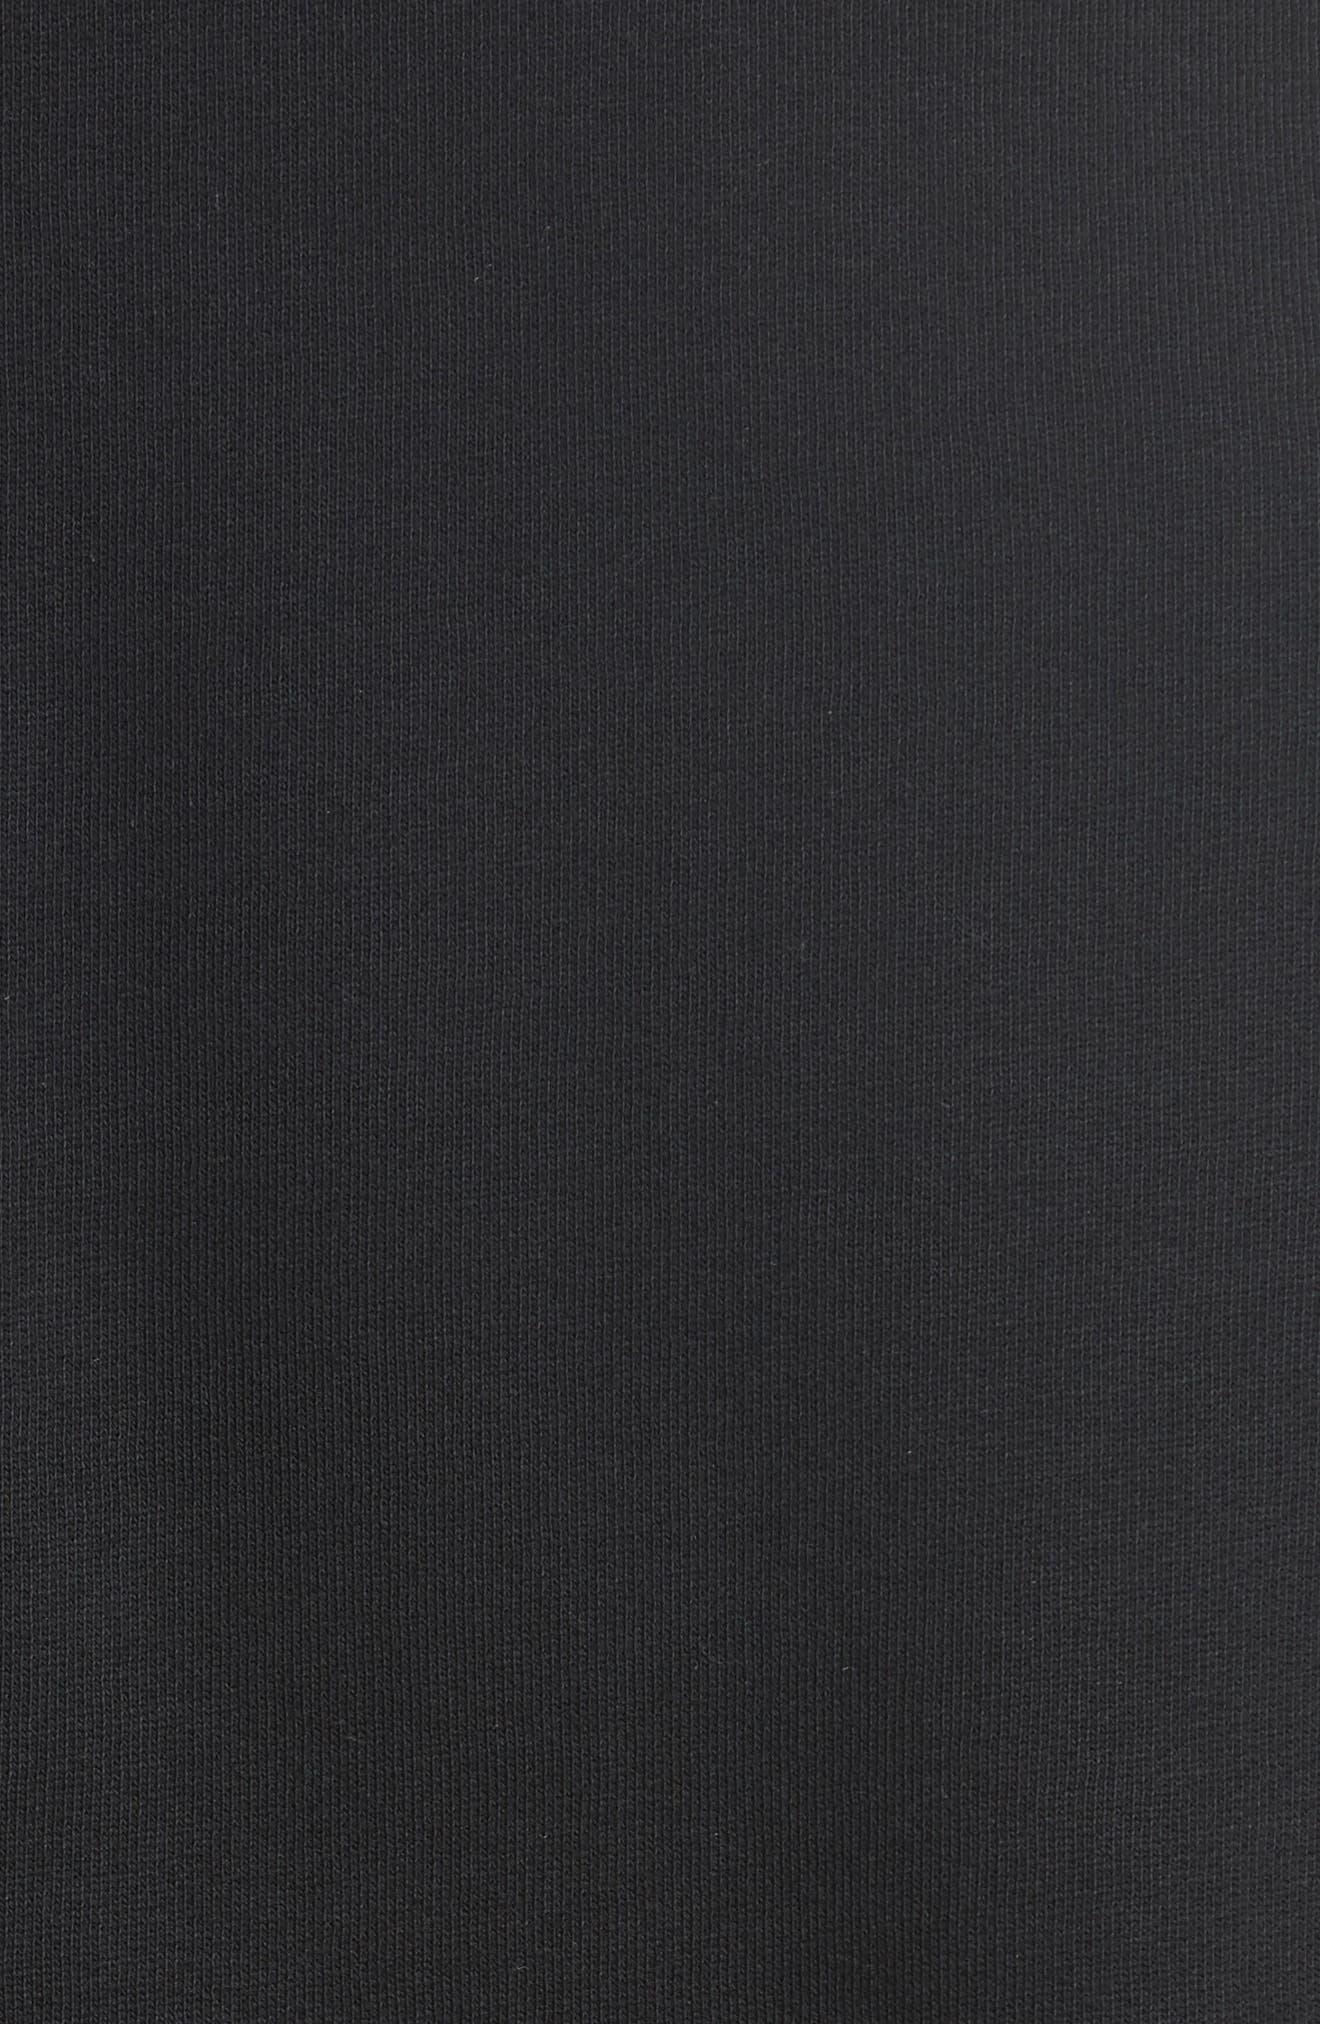 Barford Crewneck Sweatshirt,                             Alternate thumbnail 5, color,                             Black